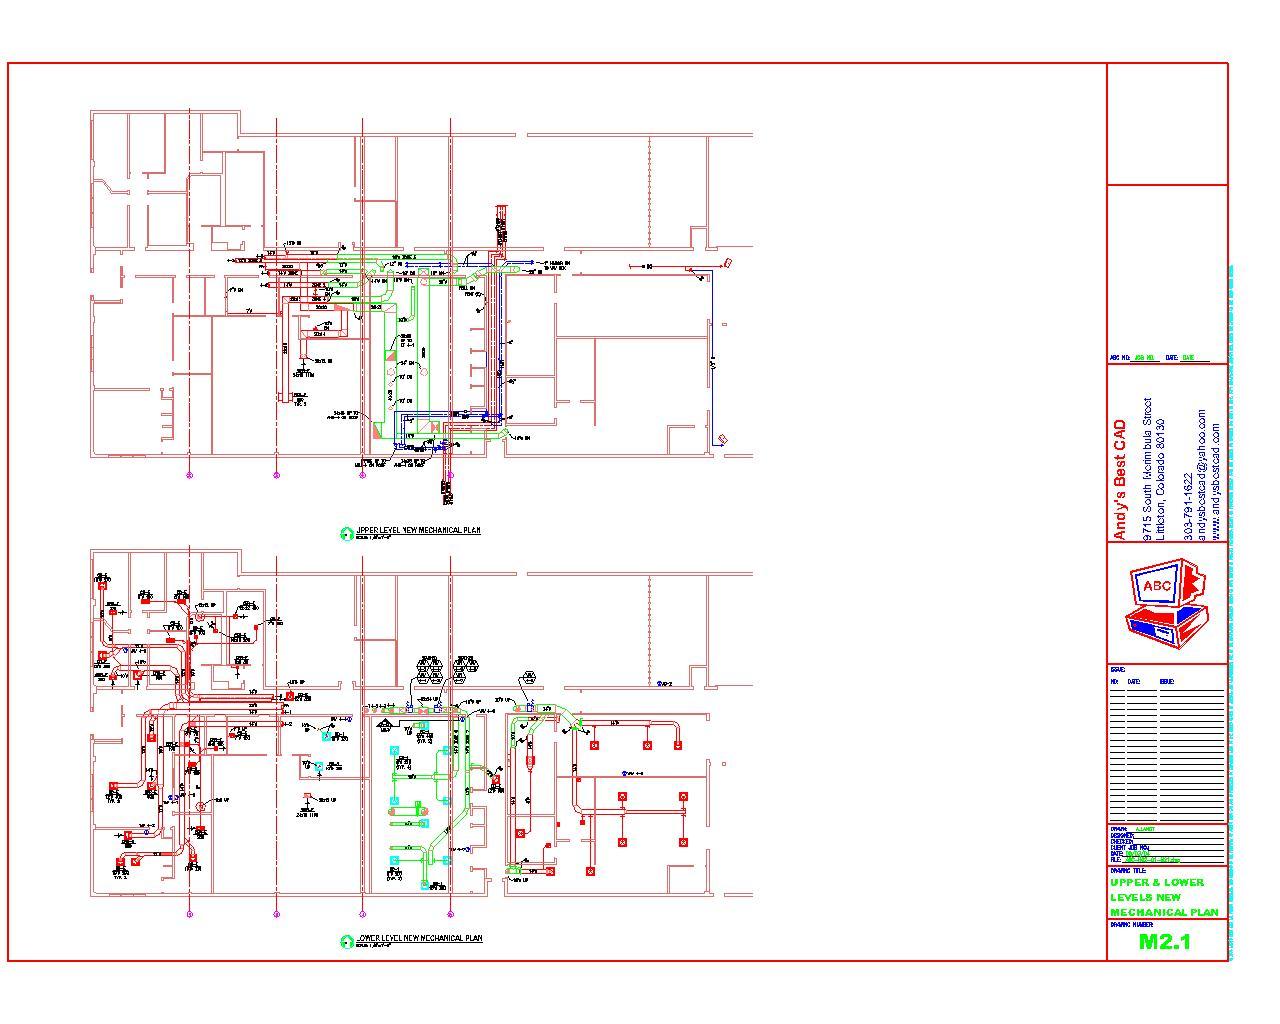 KC_2175] Hvac Drawing Sample Free Diagram | Hvac Drawing Samples |  | Anist Geis Onom Ginia Sulf Proe Waro Sputa Jebrp Faun Attr Benkeme  Mohammedshrine Librar Wiring 101